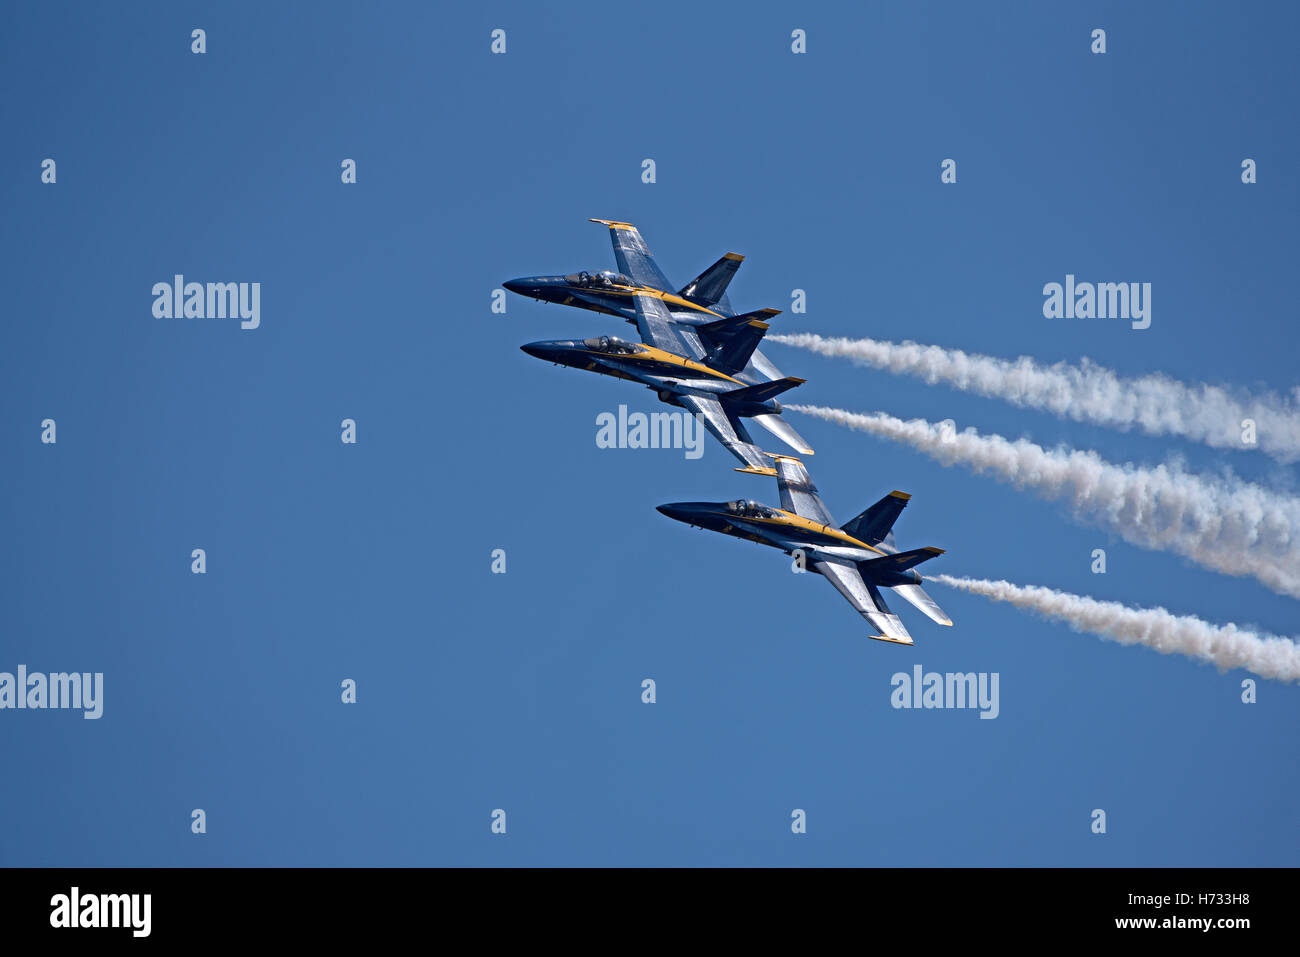 NAS Pensacola Florida USA  Blue Angels FA 18 Hornet jets in flight over their Pensacola base Stock Photo